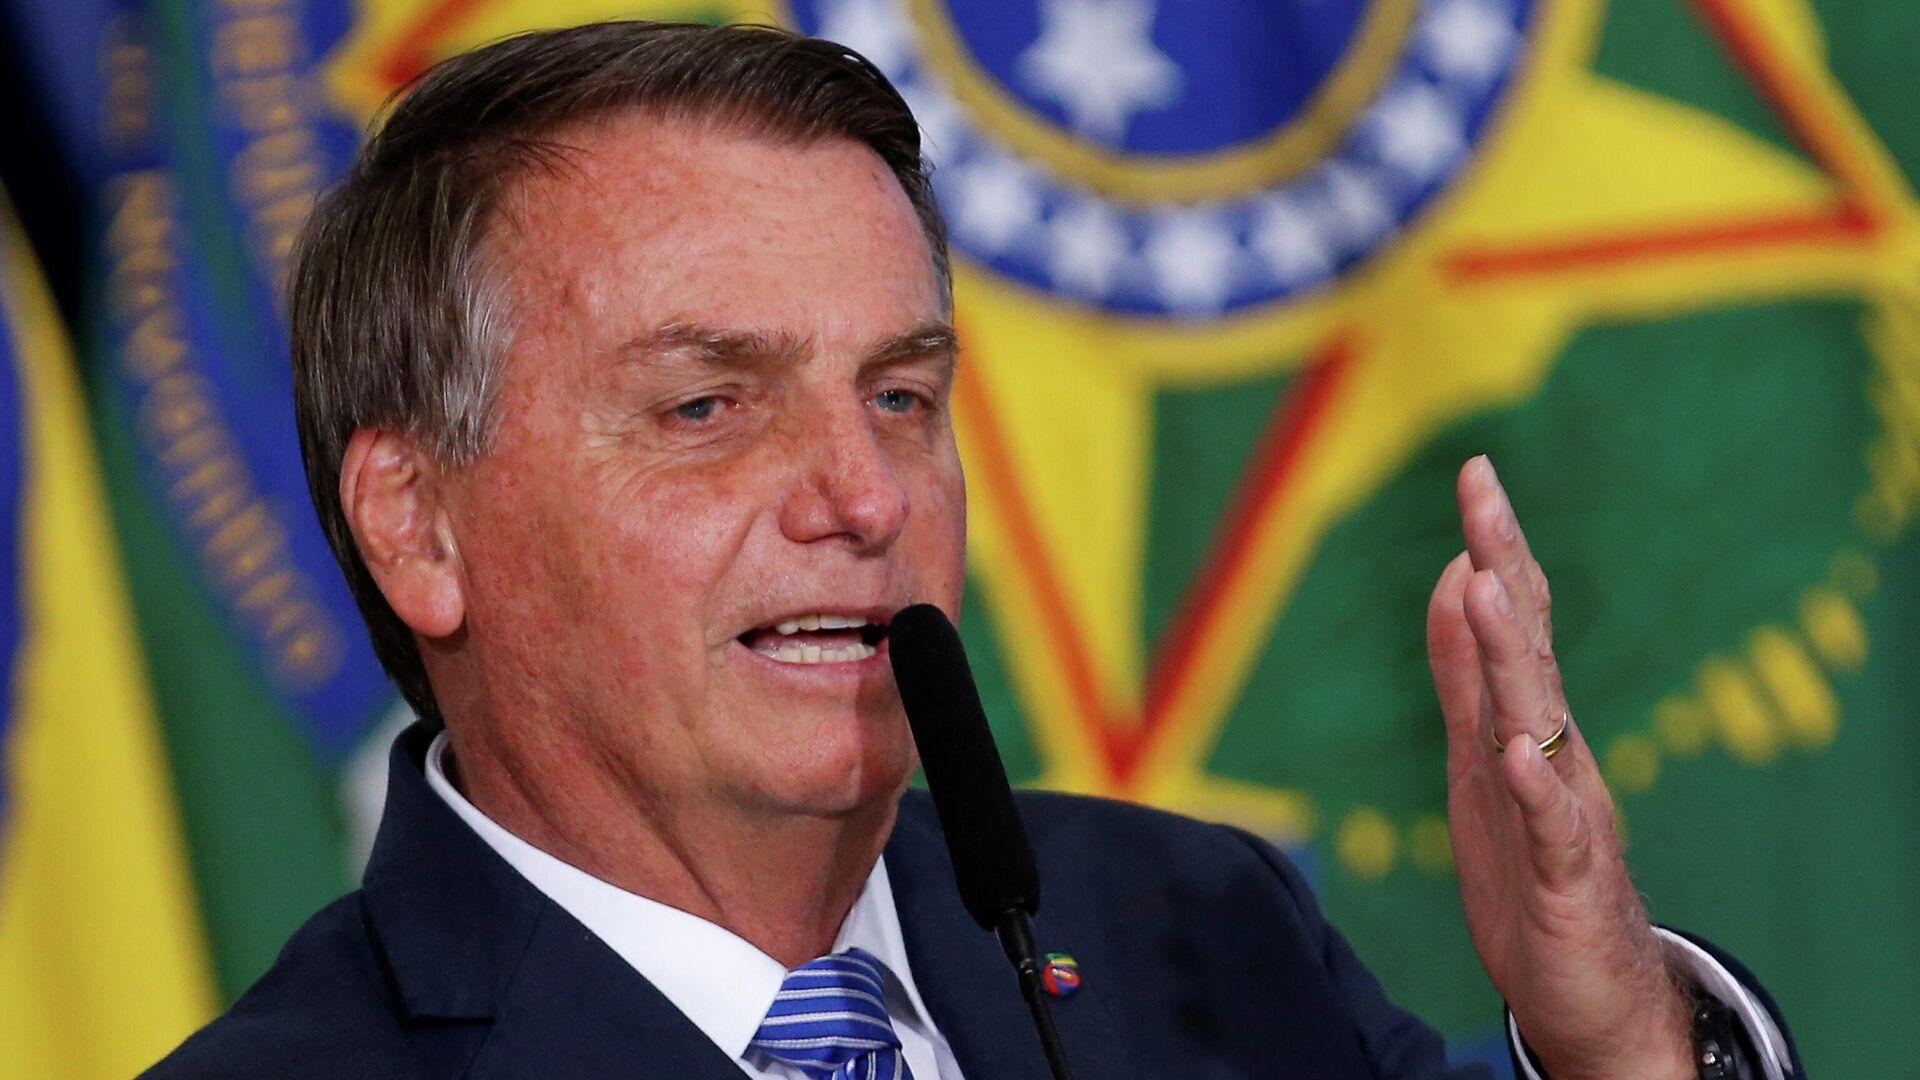 El presidente brasileño, Jair Bolsonaro - Sputnik Mundo, 1920, 06.09.2021